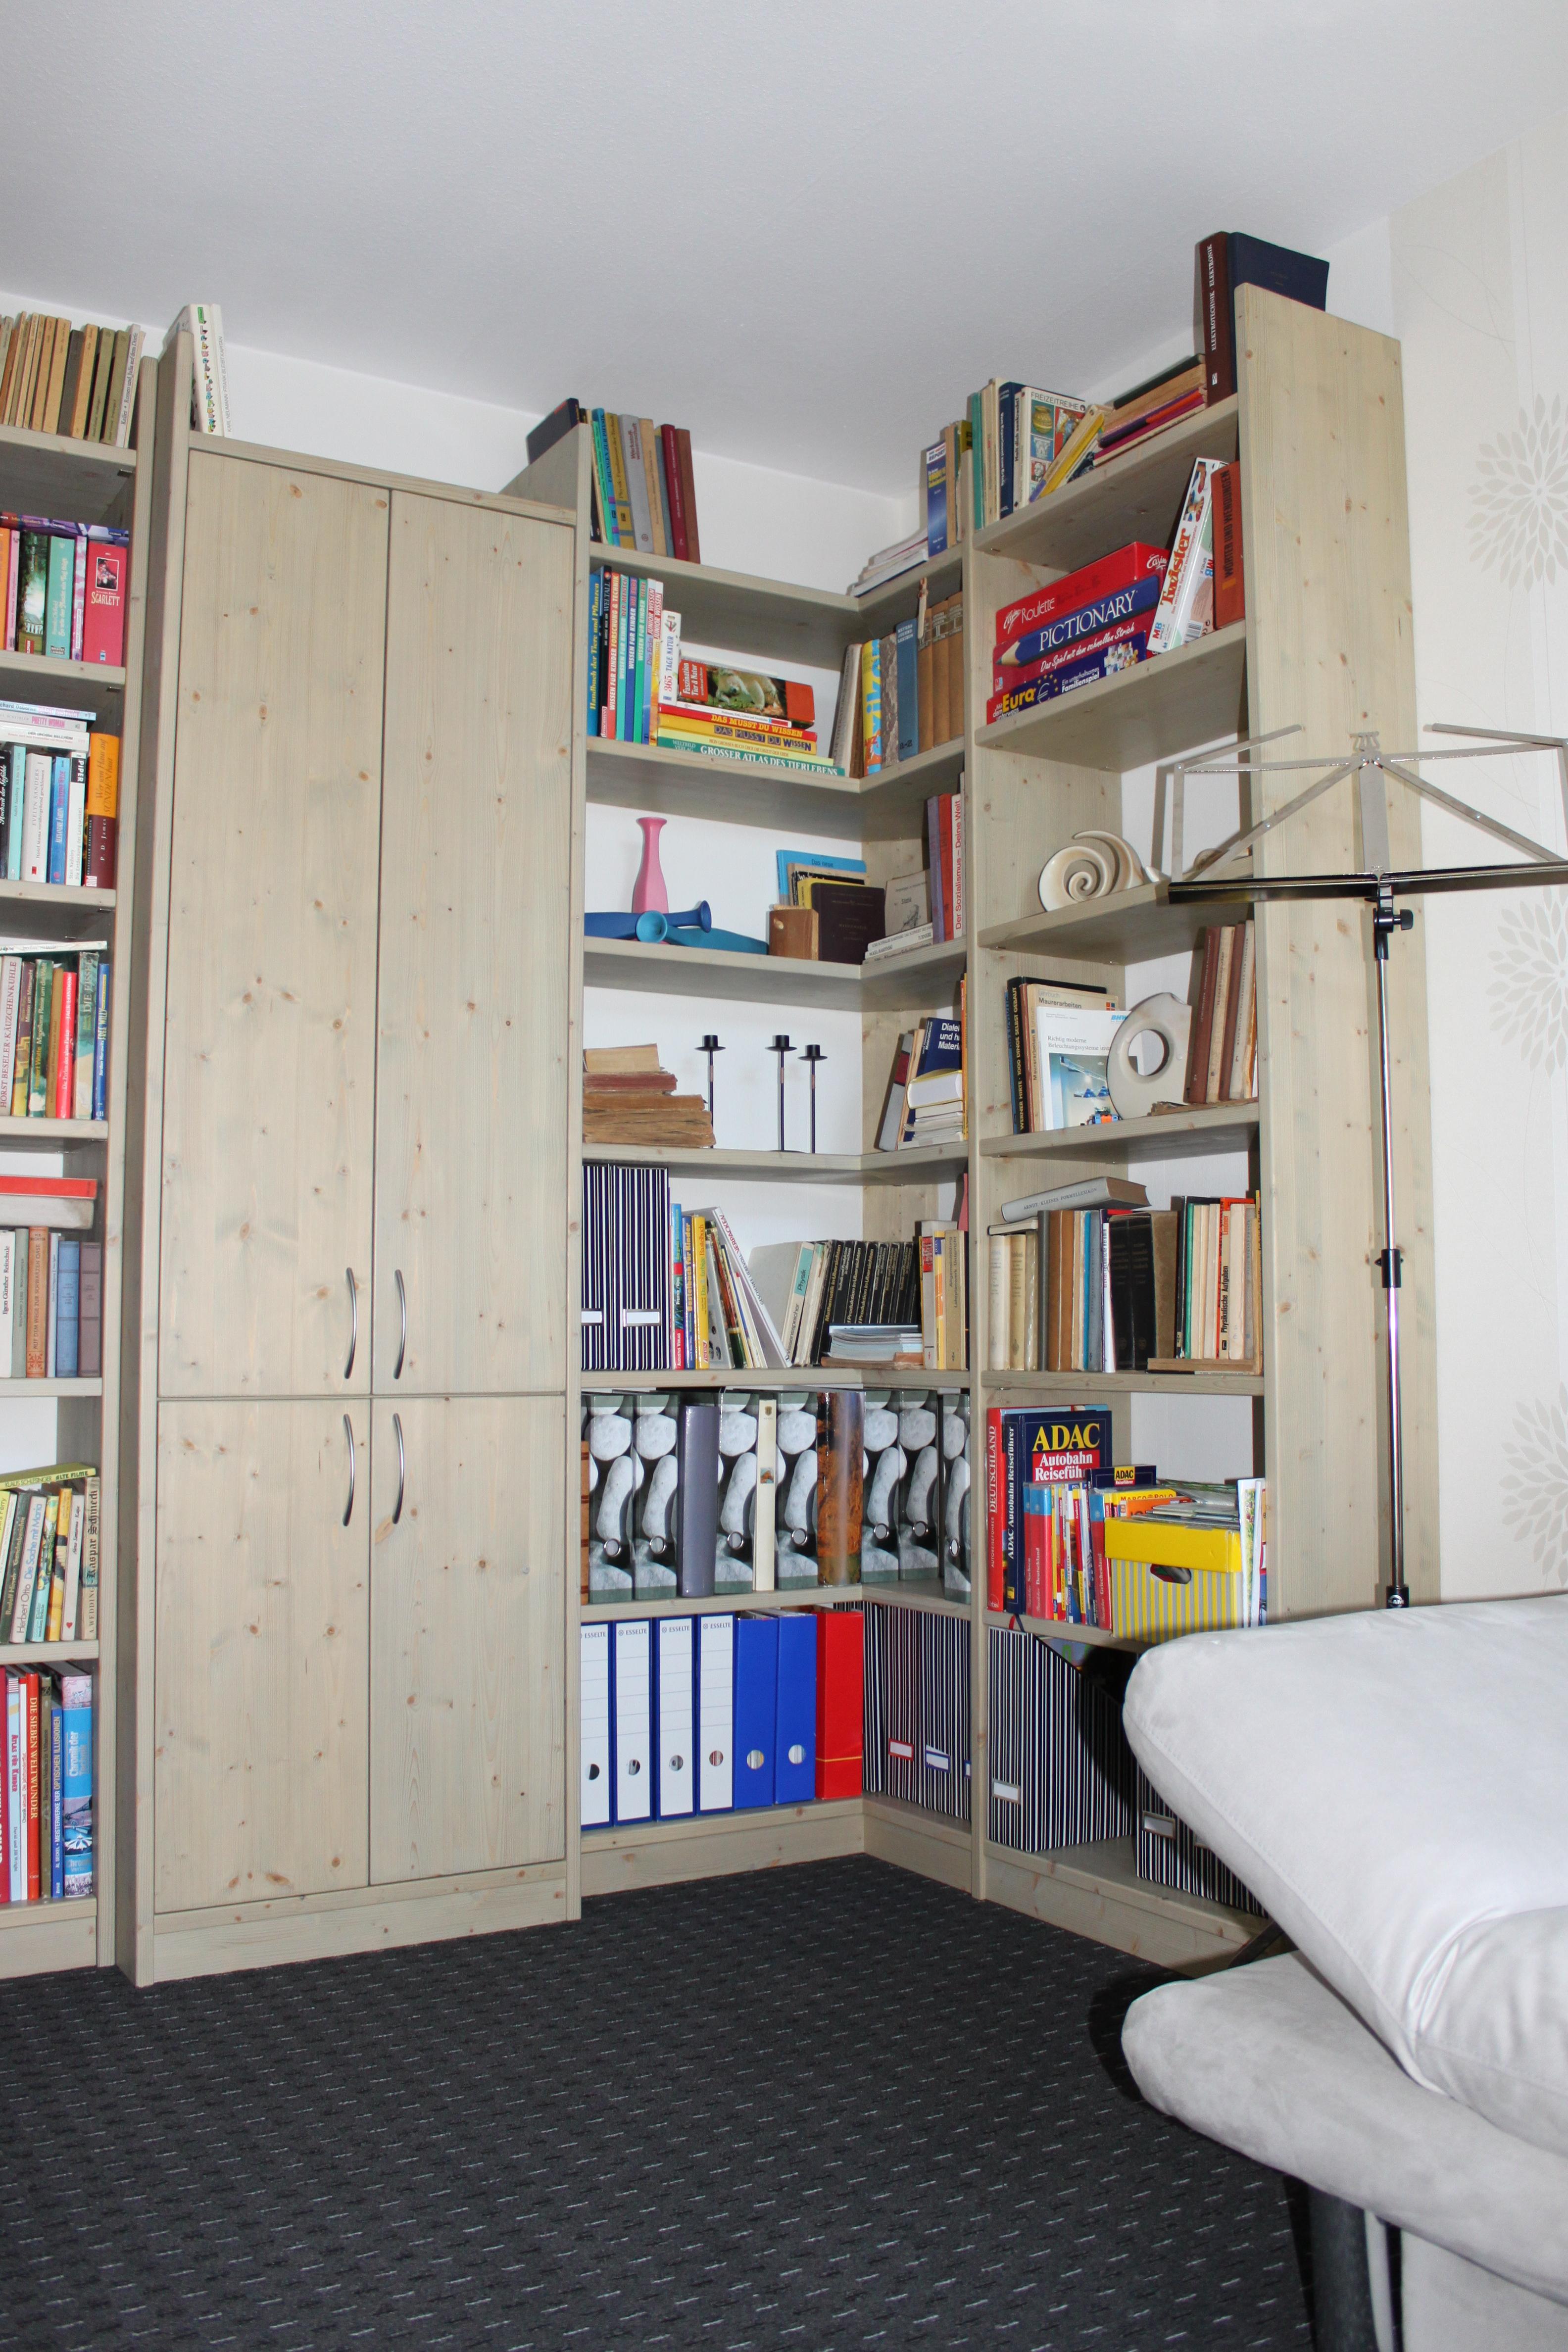 schreinerei bei backnang fertigt eckregal einbauregal u form. Black Bedroom Furniture Sets. Home Design Ideas